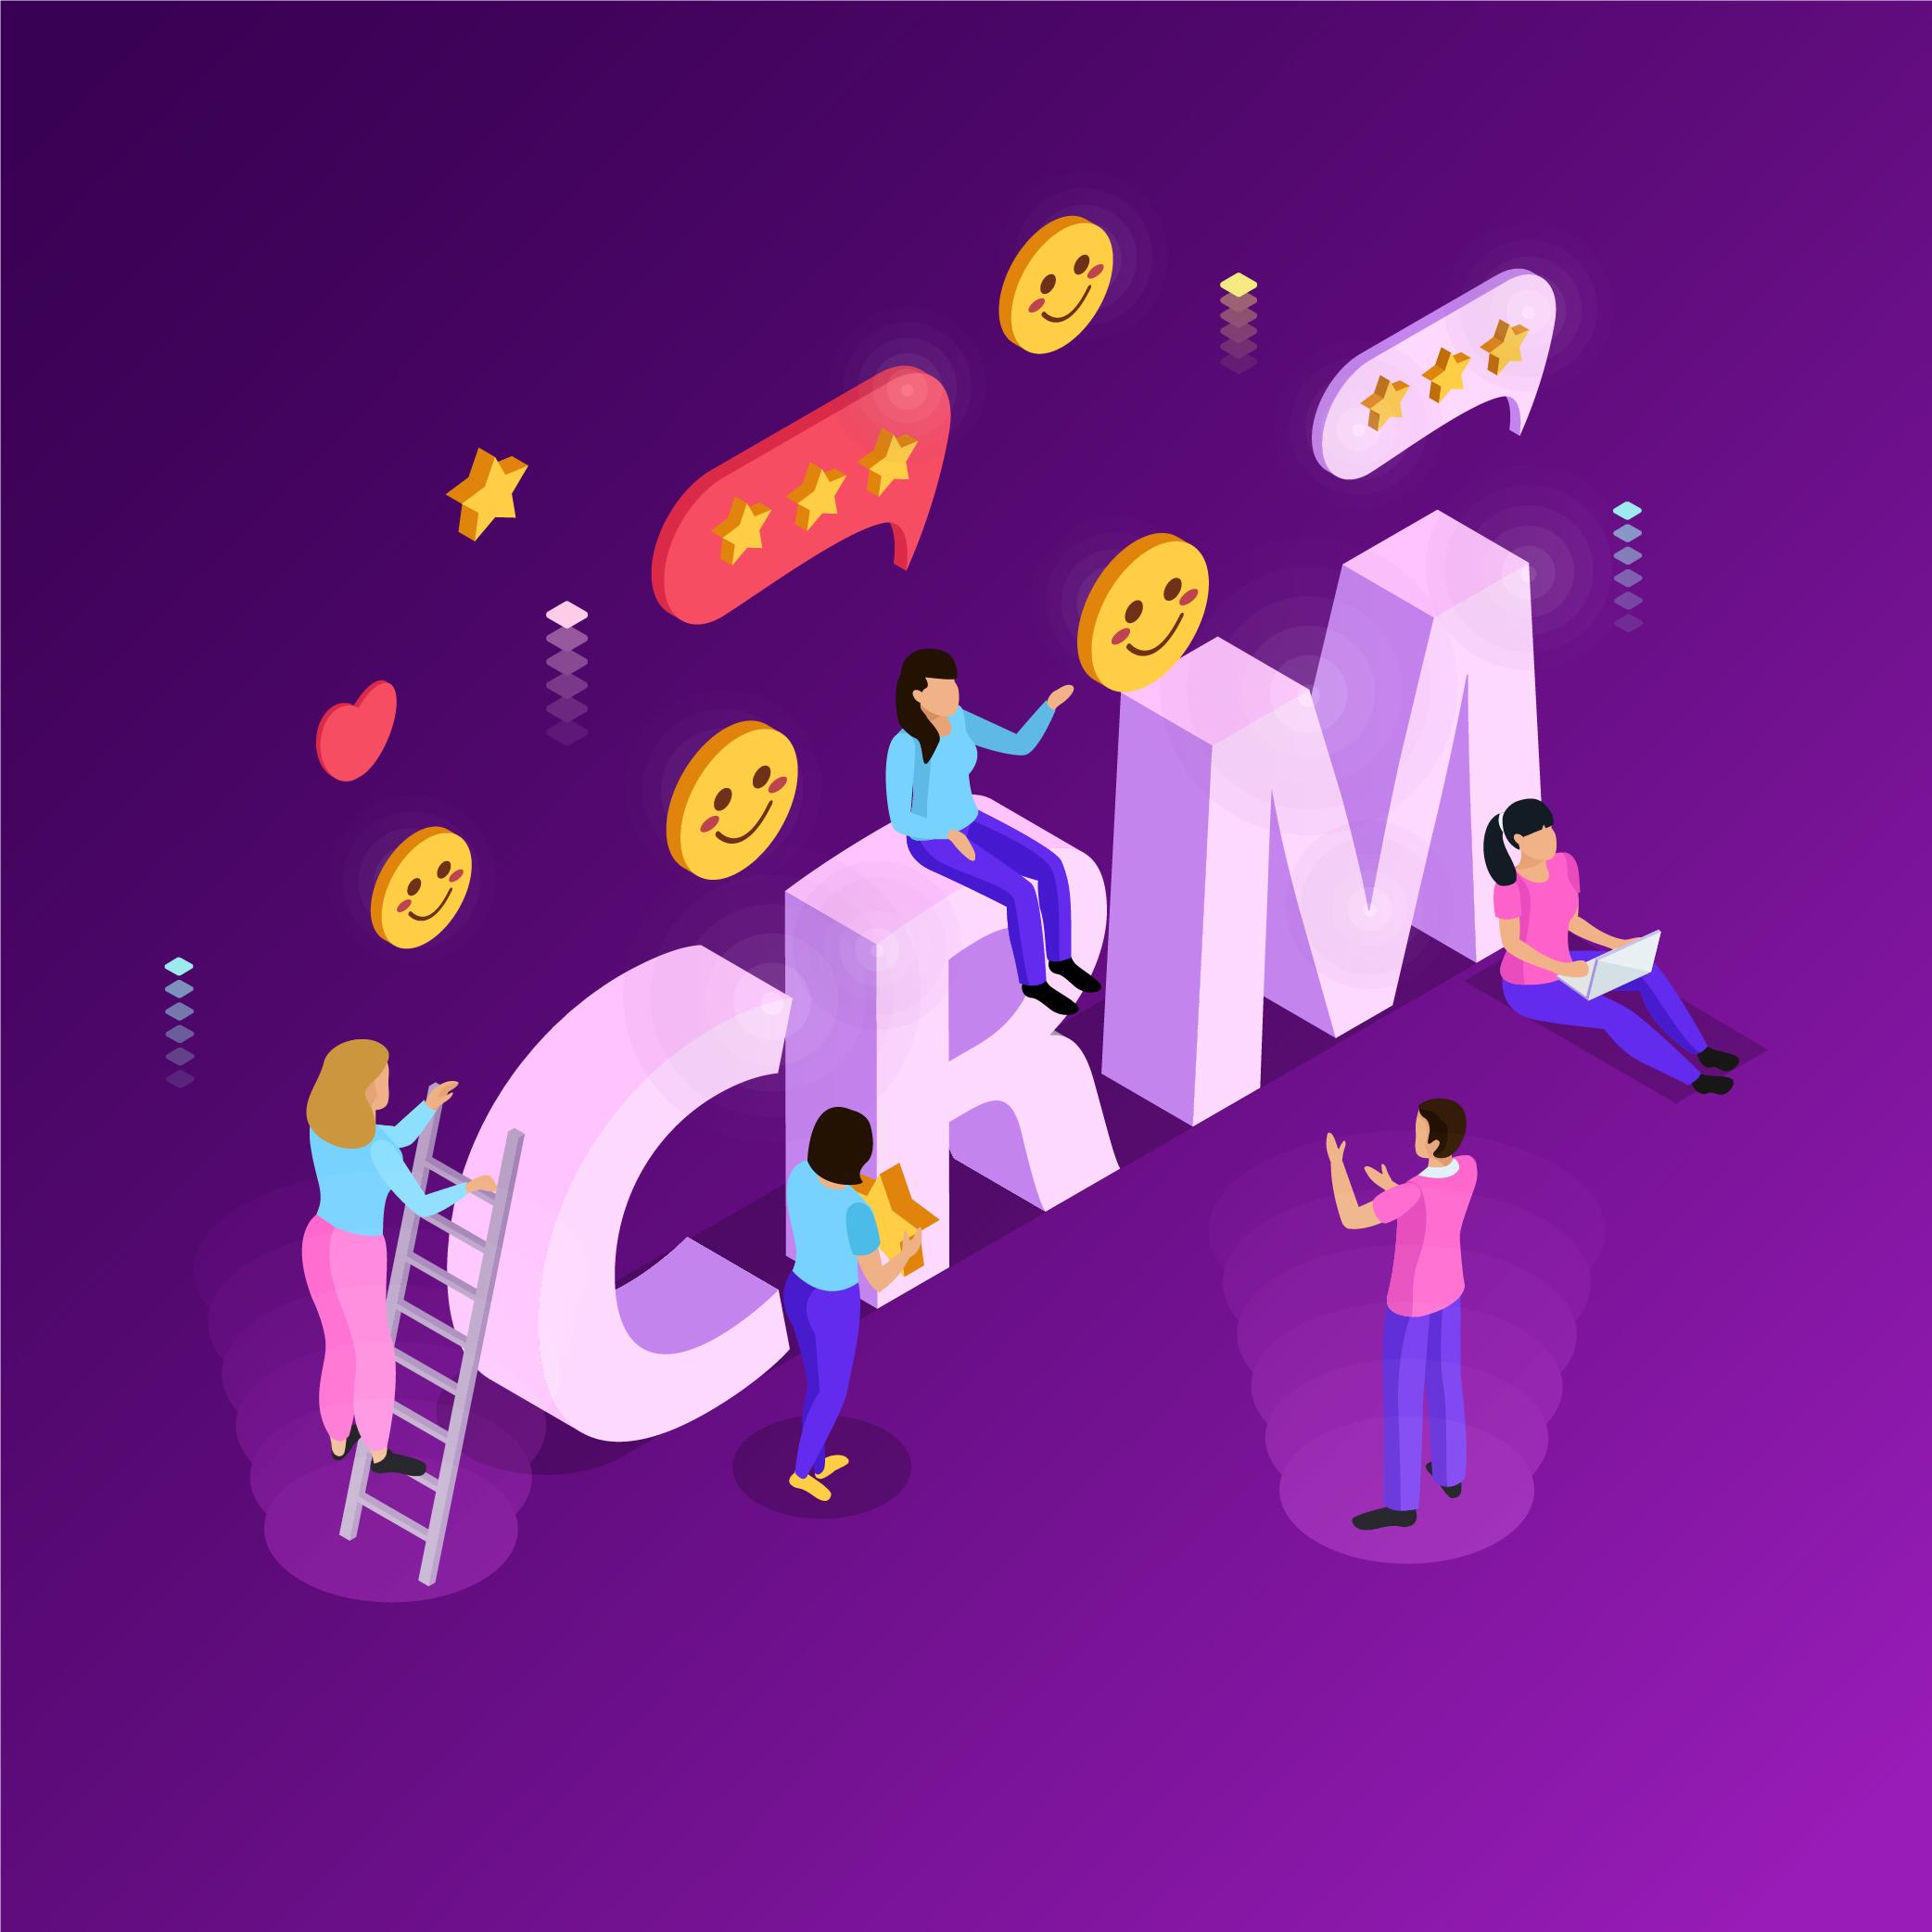 پروتکل CRM - Customer Relationship Management - شبکه کالا - shabakekala - مشتری